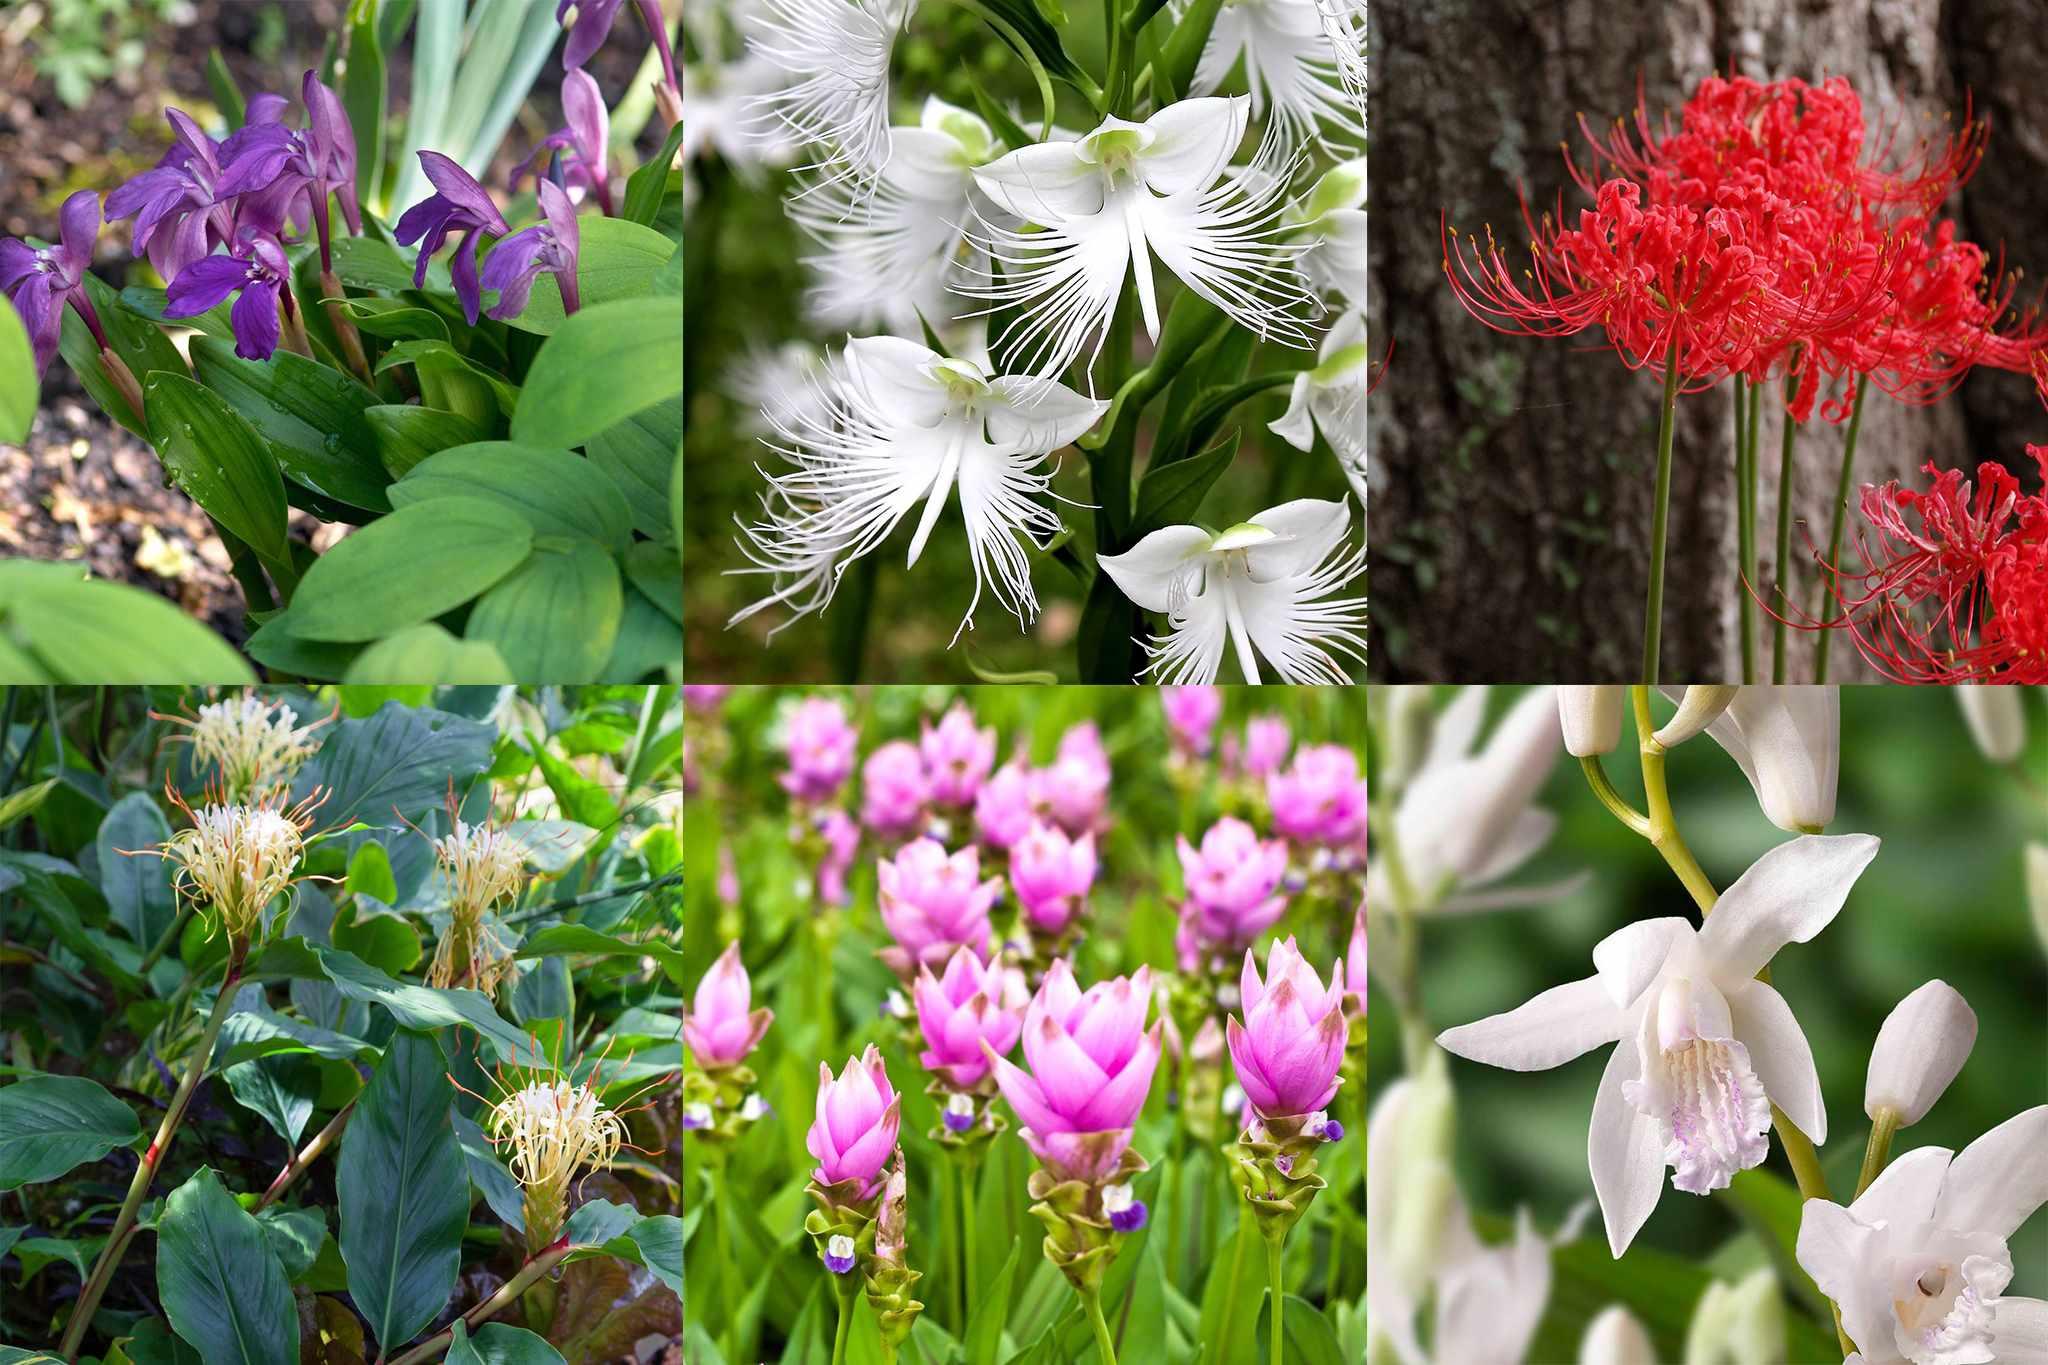 farmer-gracy-japansese-plant-collection_V2-2048-1365